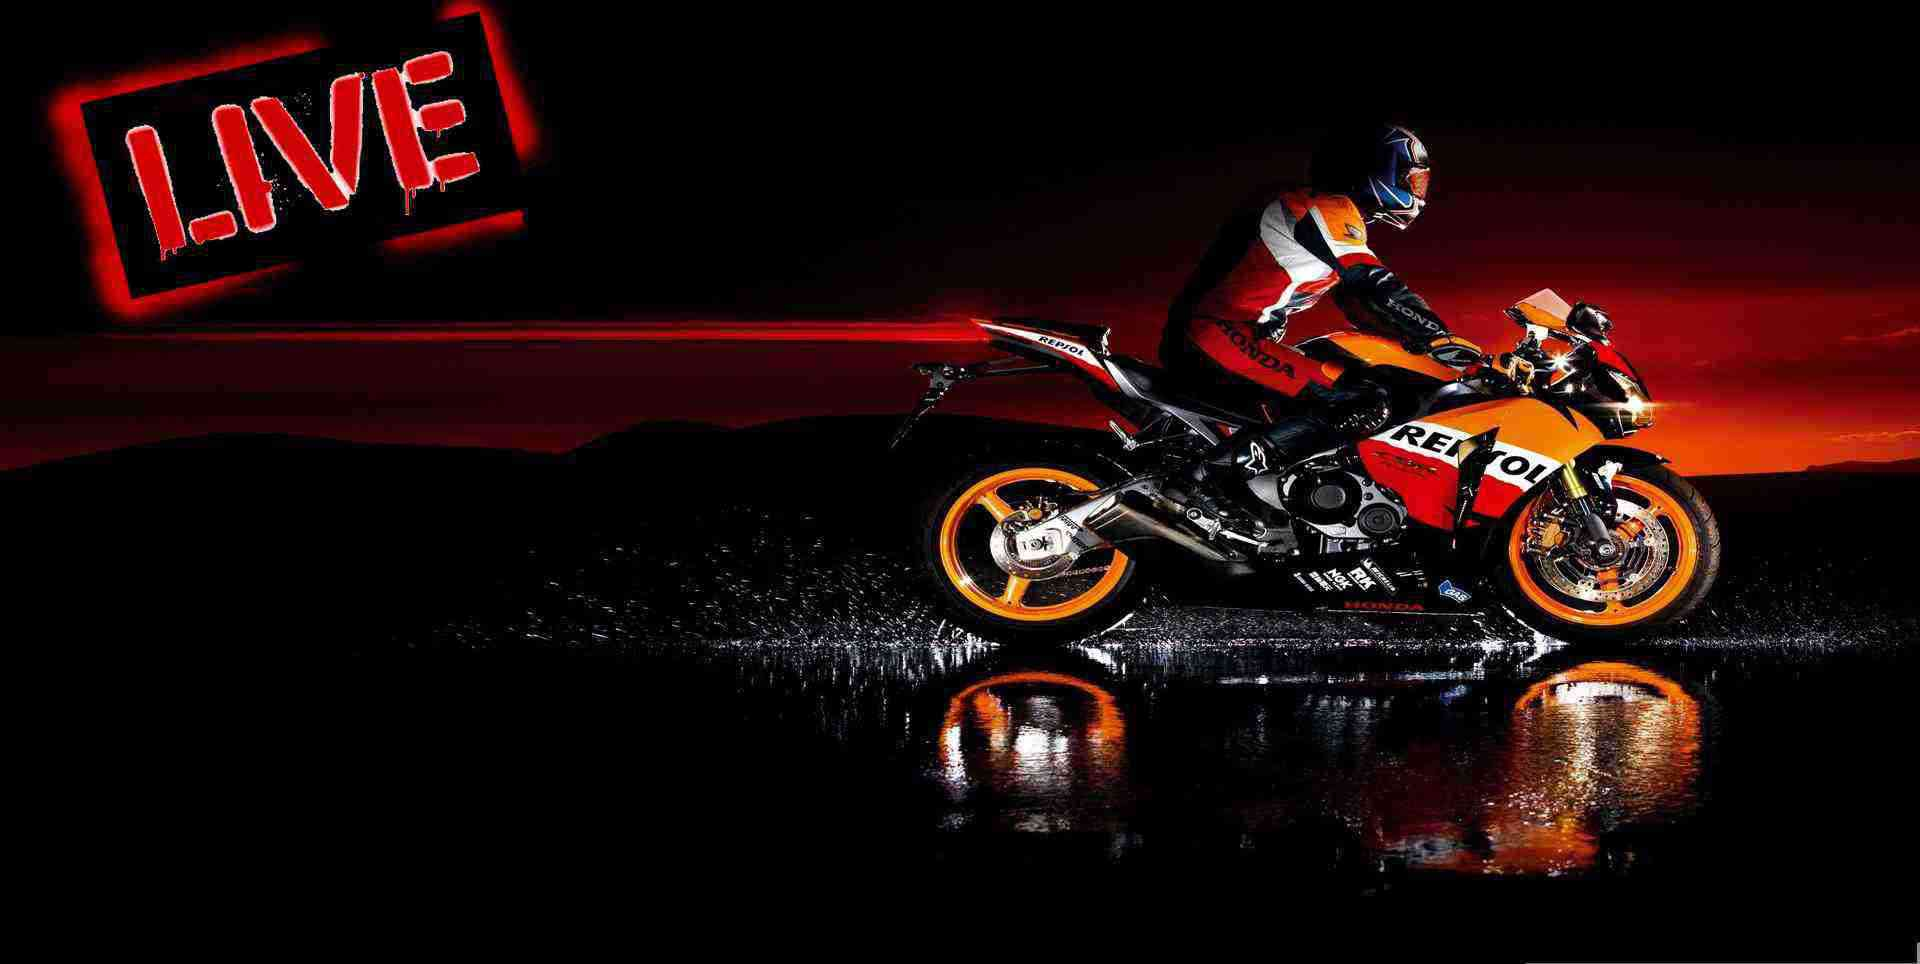 Pirelli Malaysian SBK Racing 2015 Online